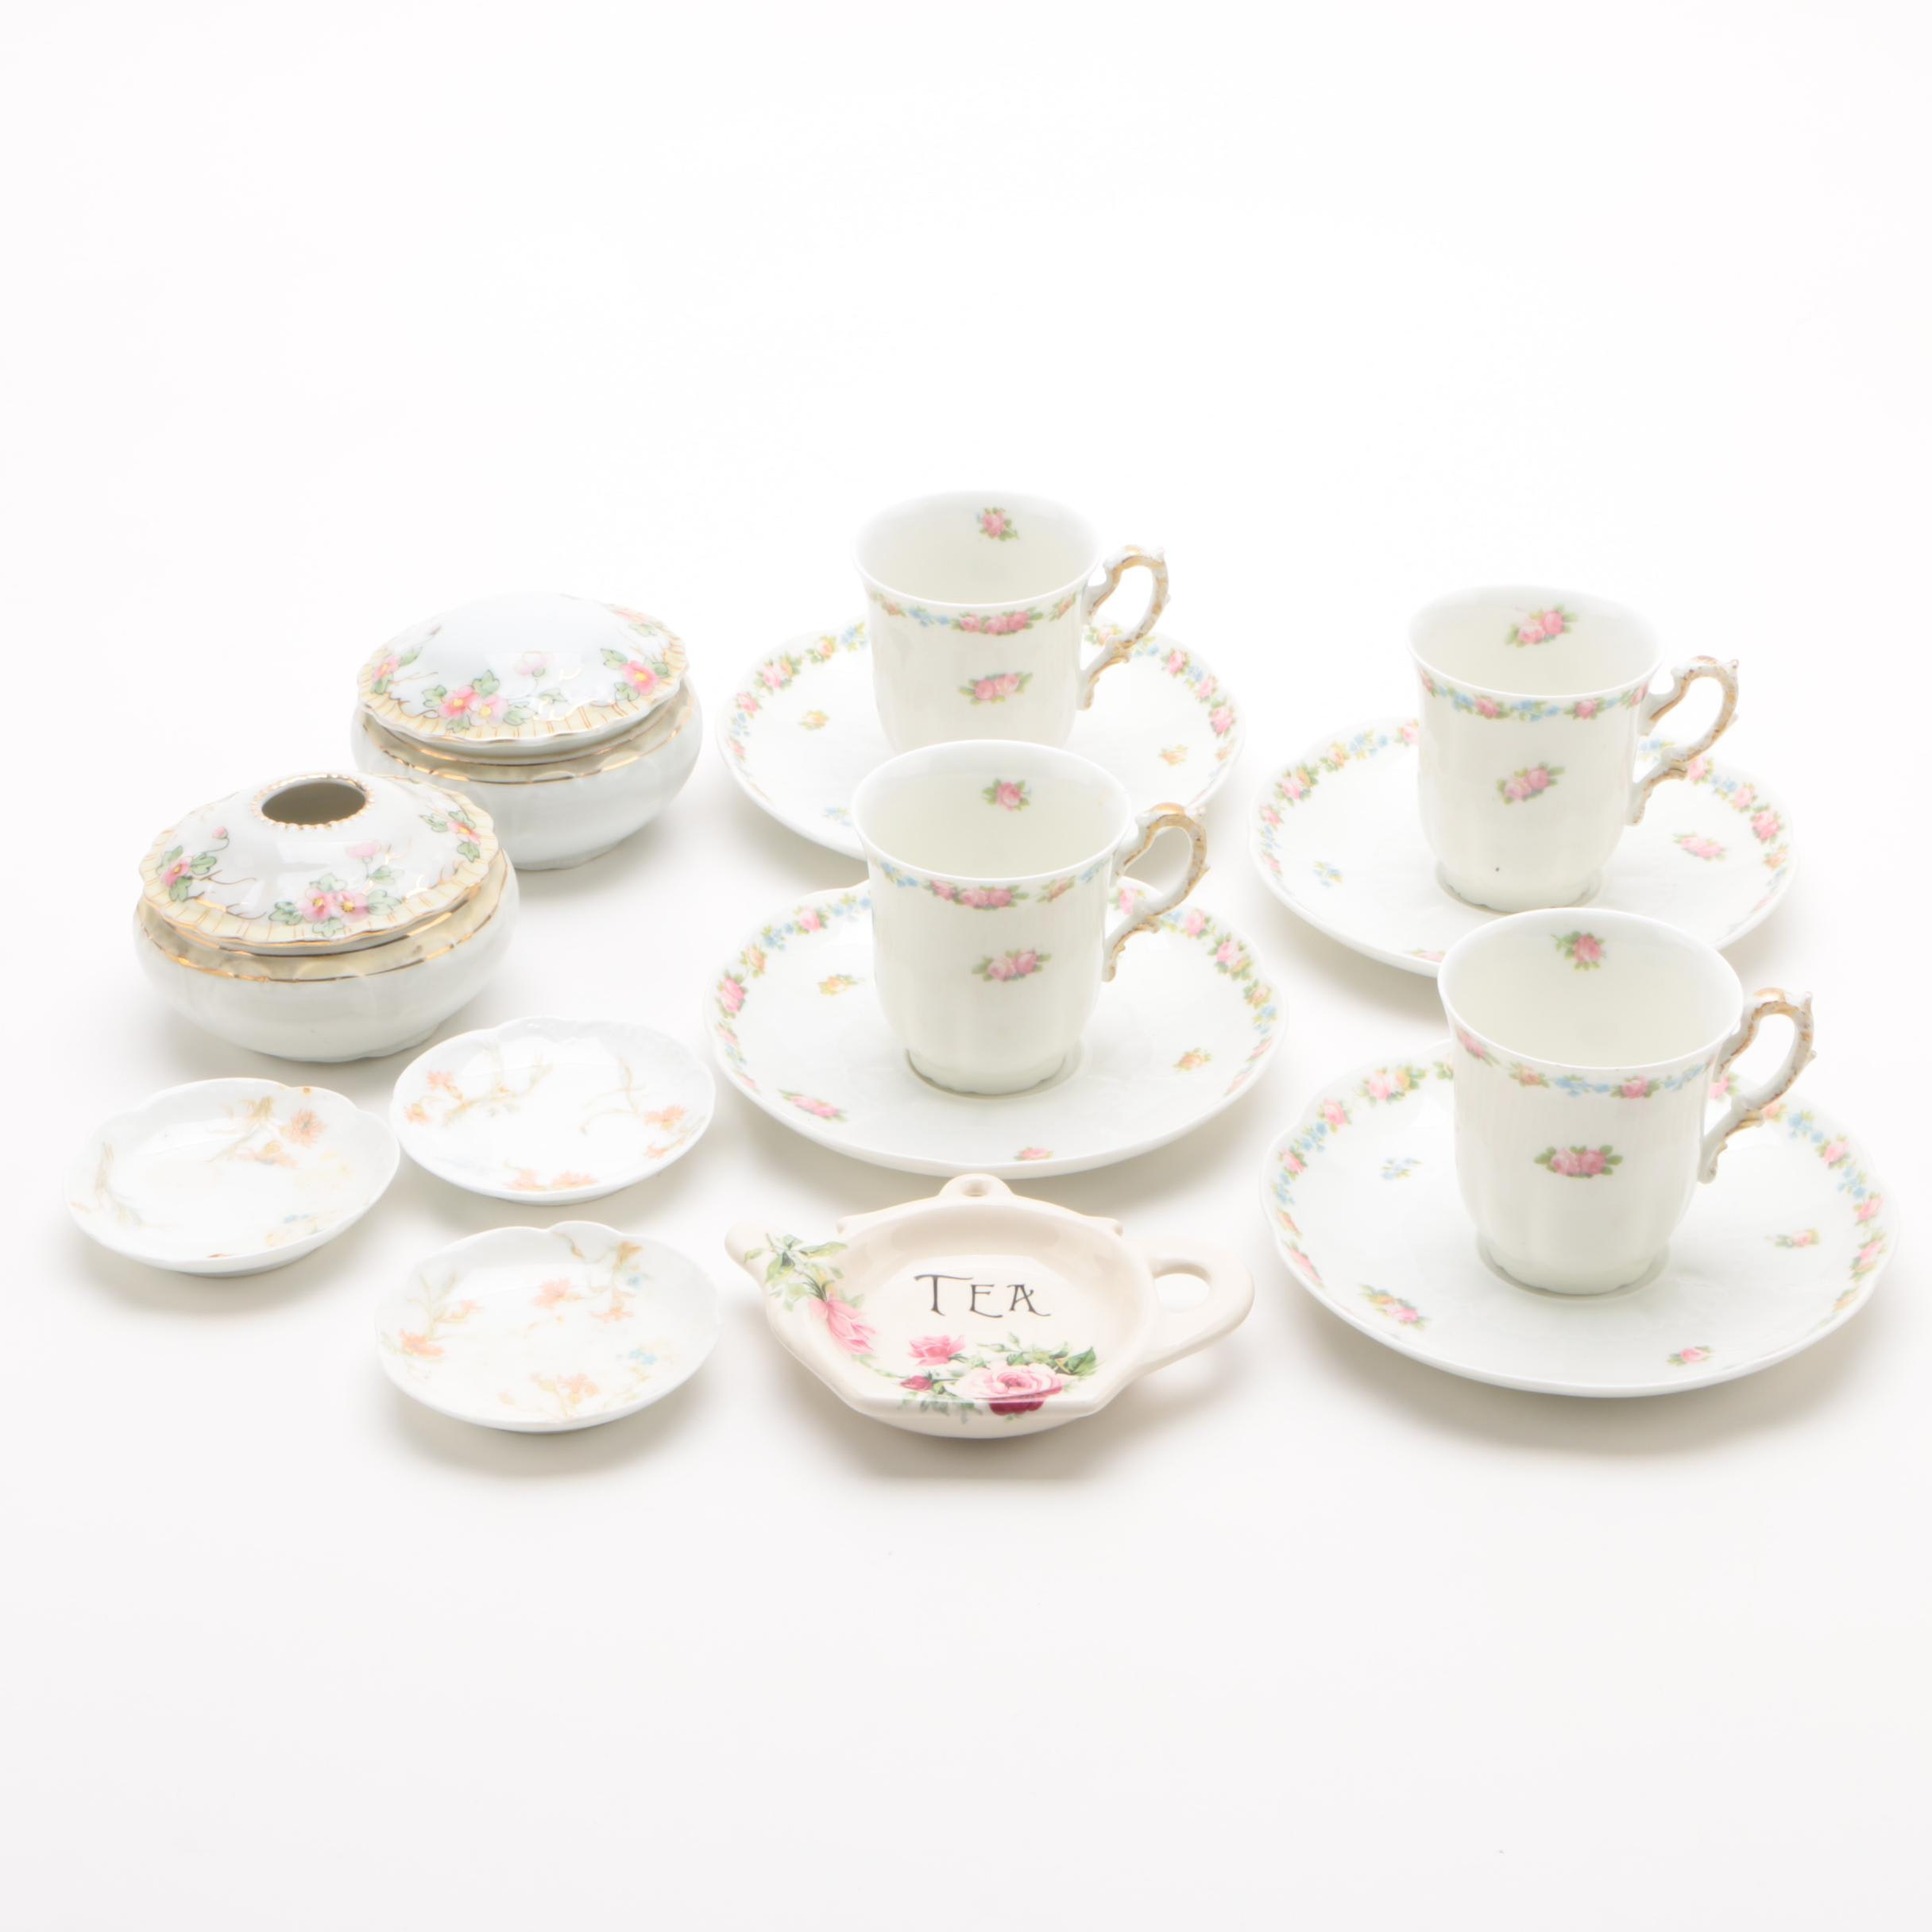 Porcelain Tea Service and Other Serveware featuring C. Ahrenfeldt